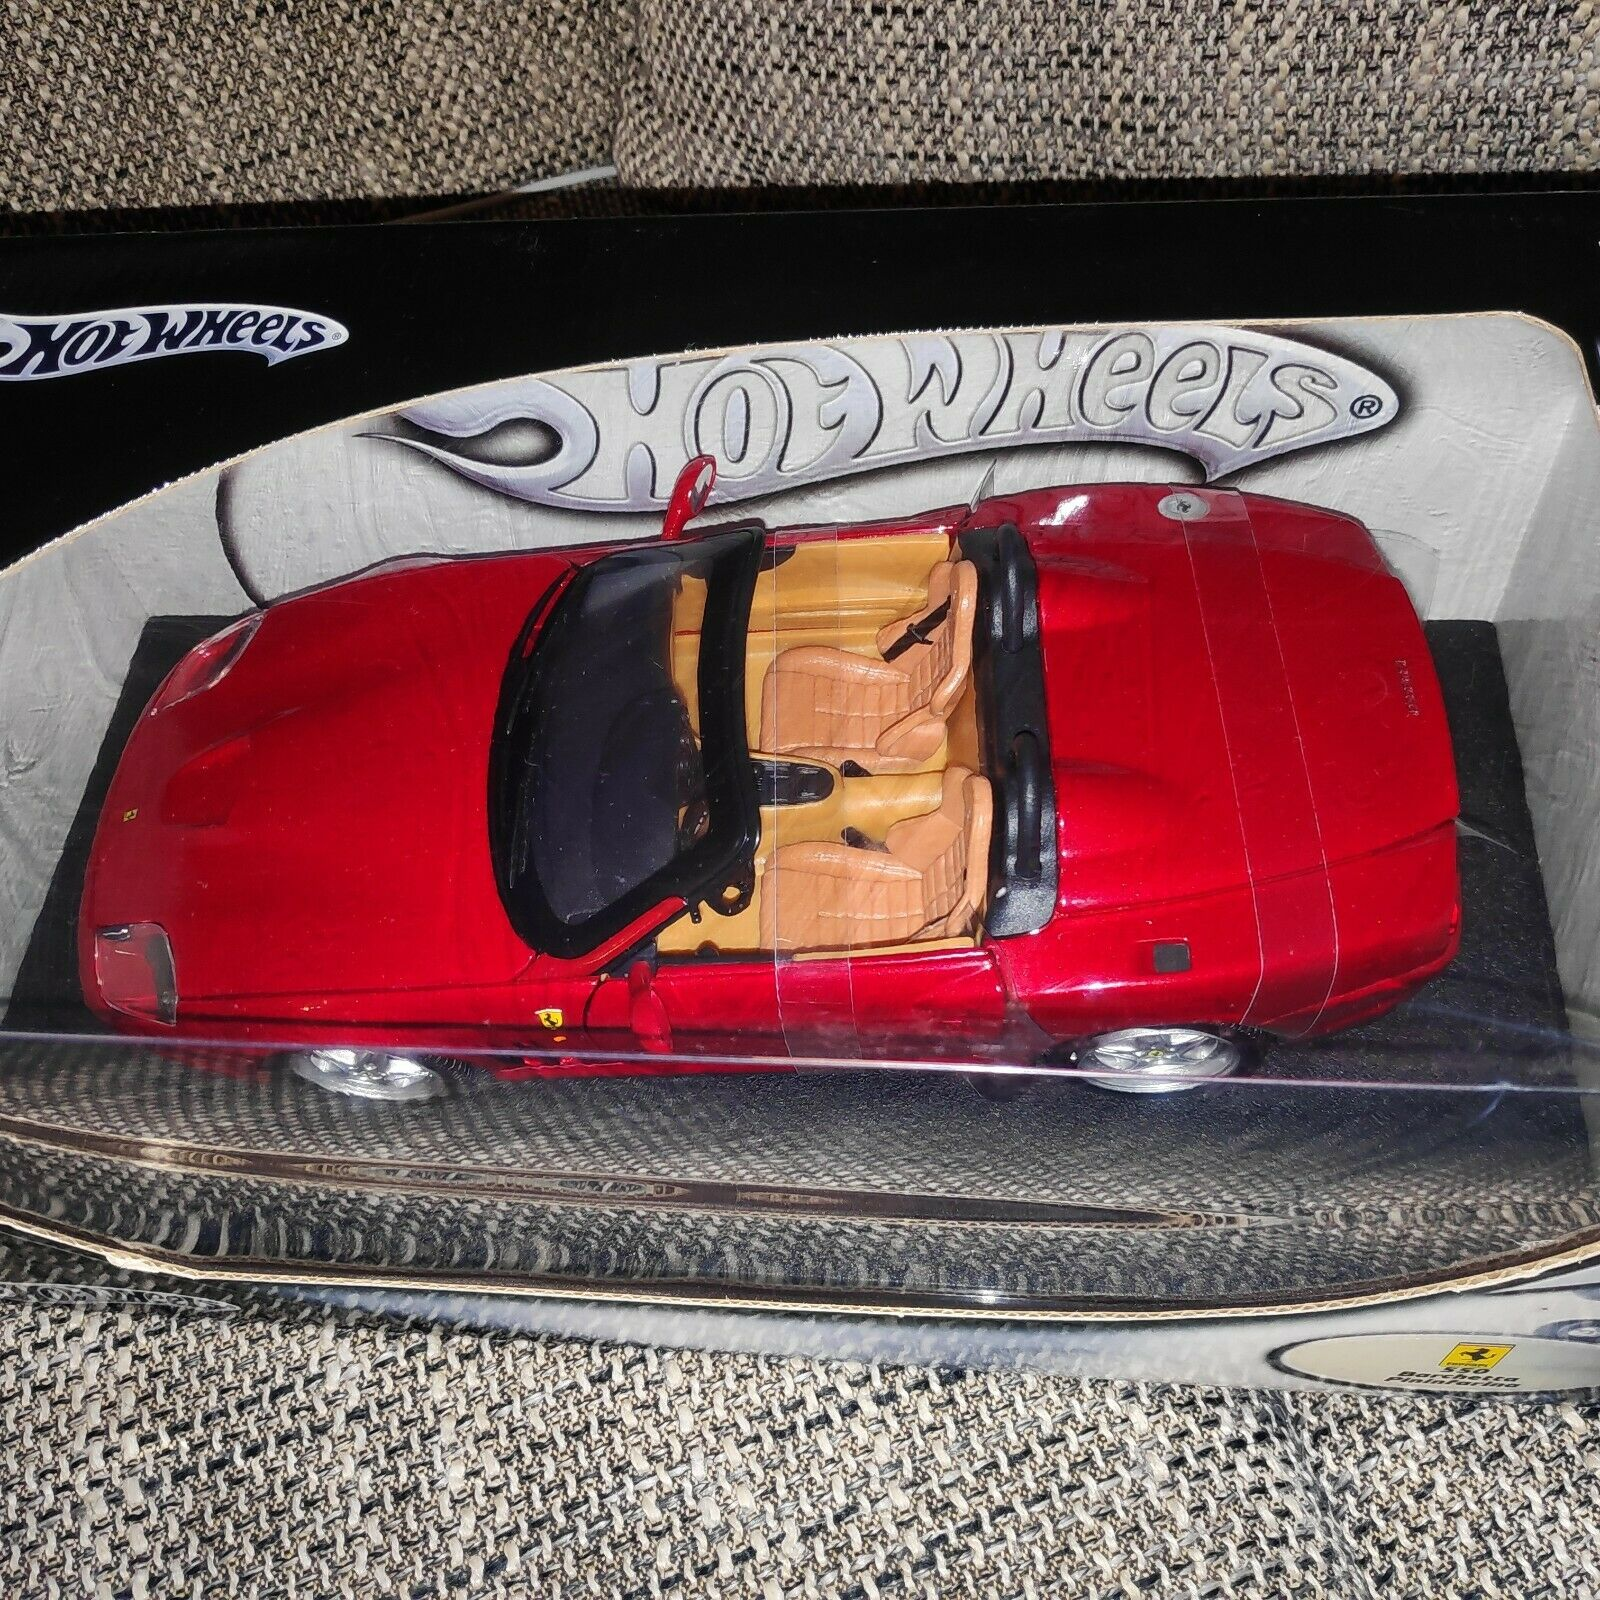 mejor opcion 131828 1 18 18 18 Hot Wheels  57311 ferrari 550 barchetta met. rojo Pininfarina top nuevo  promociones